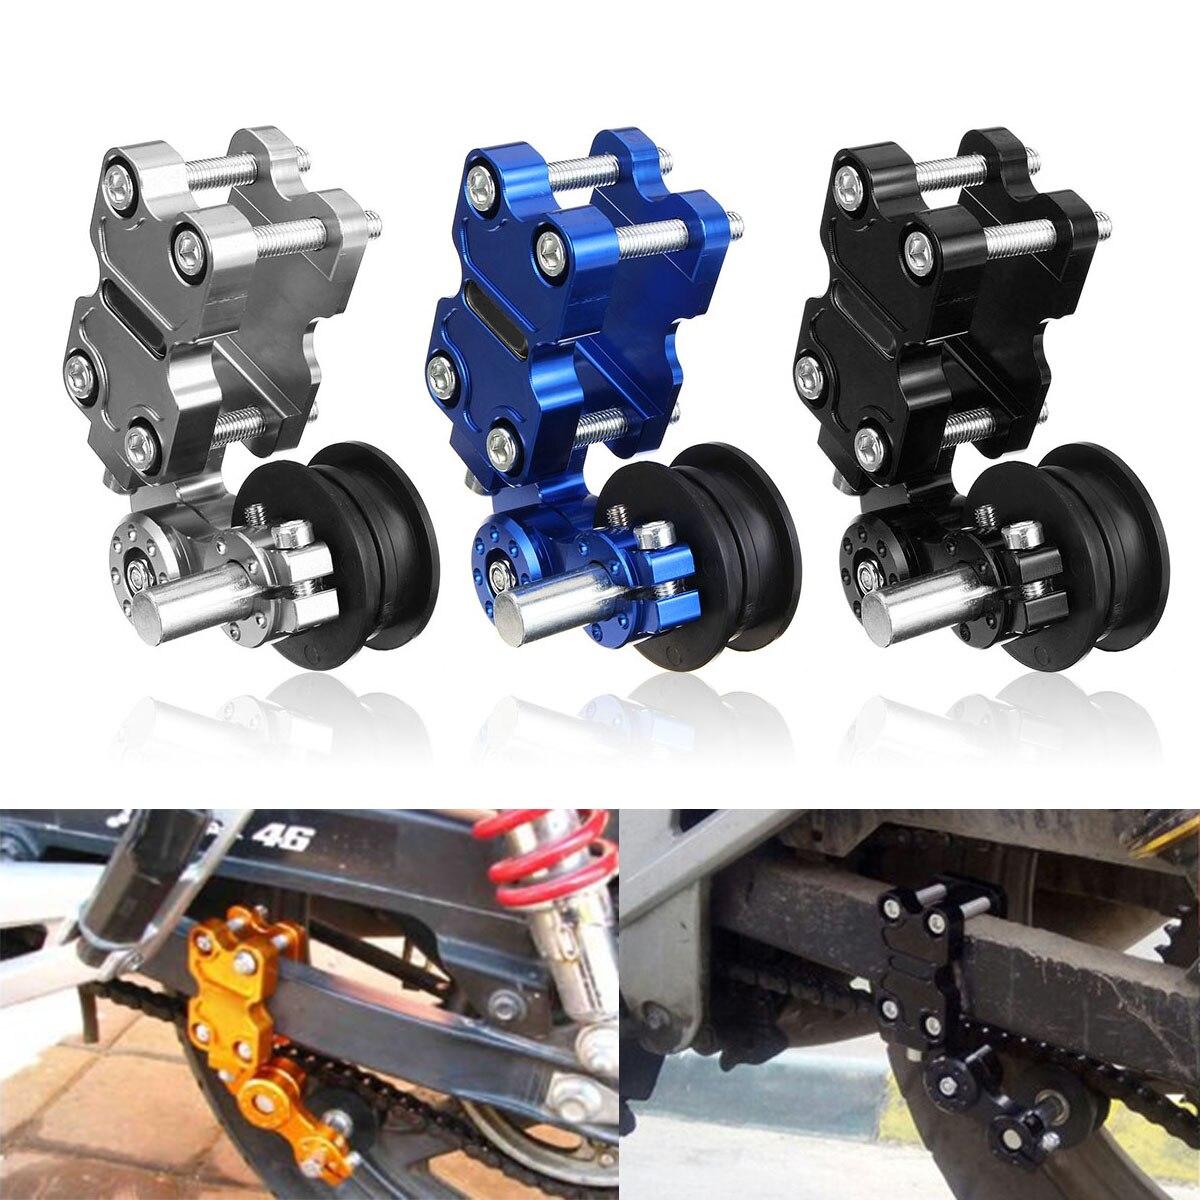 Black Silver Universal  Aluminum Adjuster Chain Tensioner Roller For Motorcycle /Chopper ATV